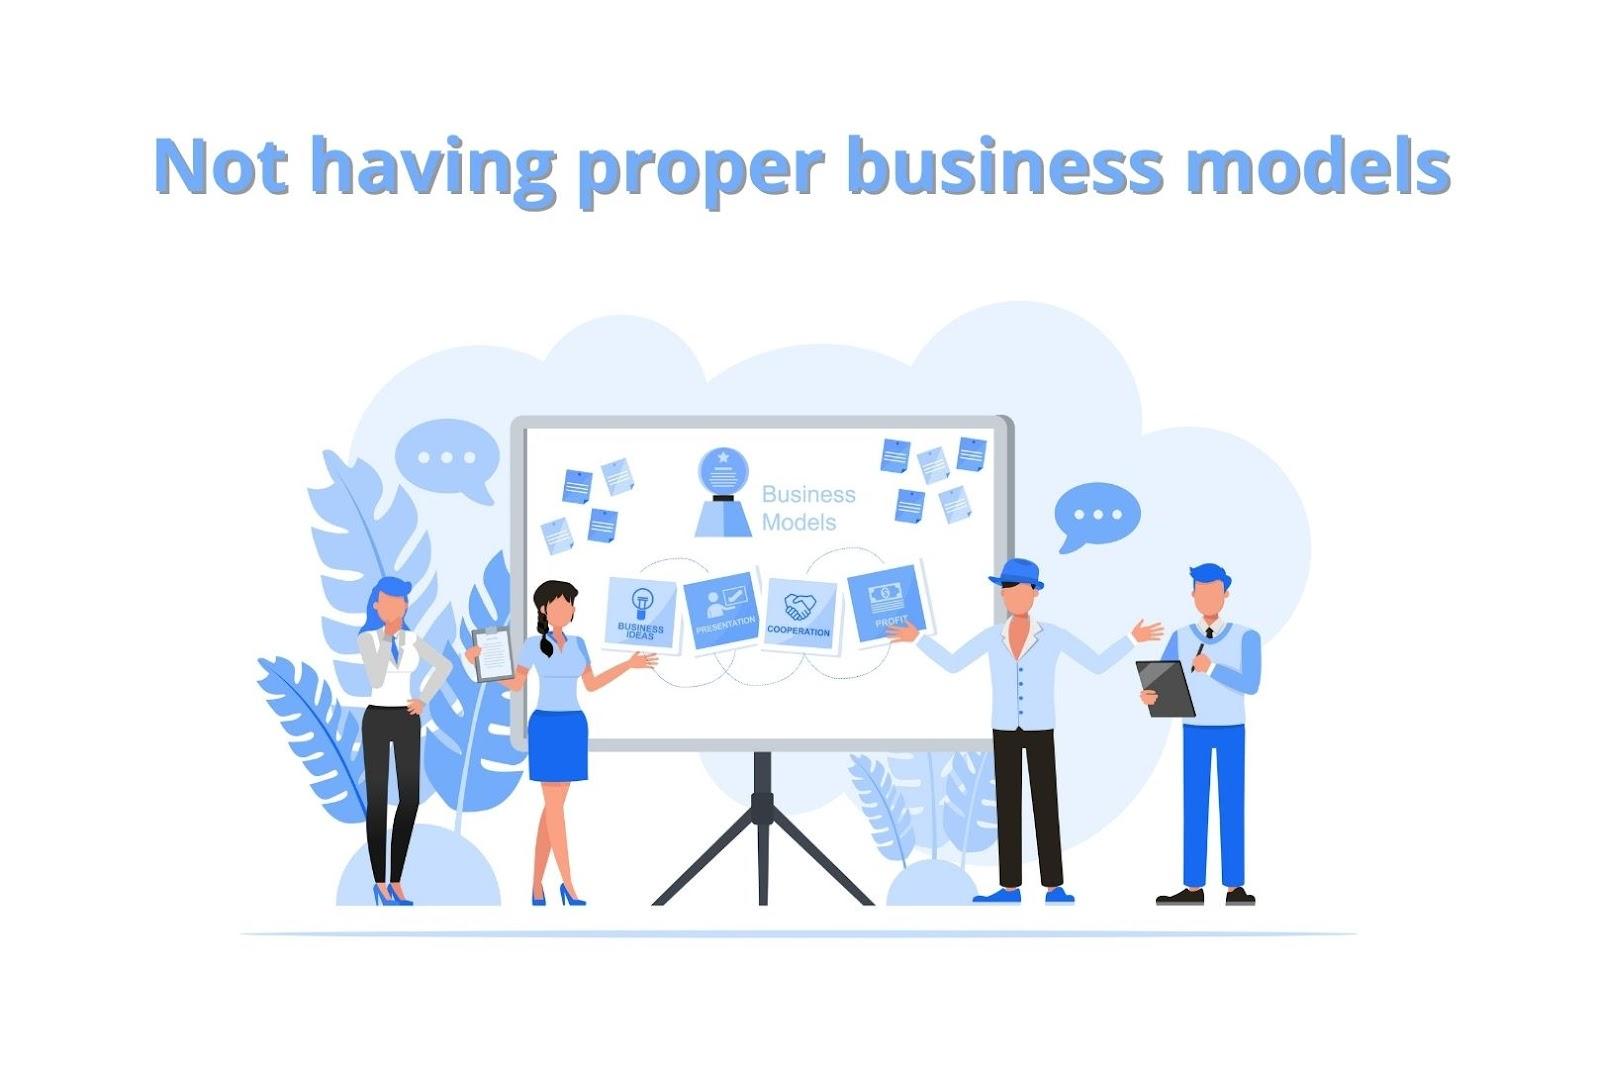 Not having proper business models